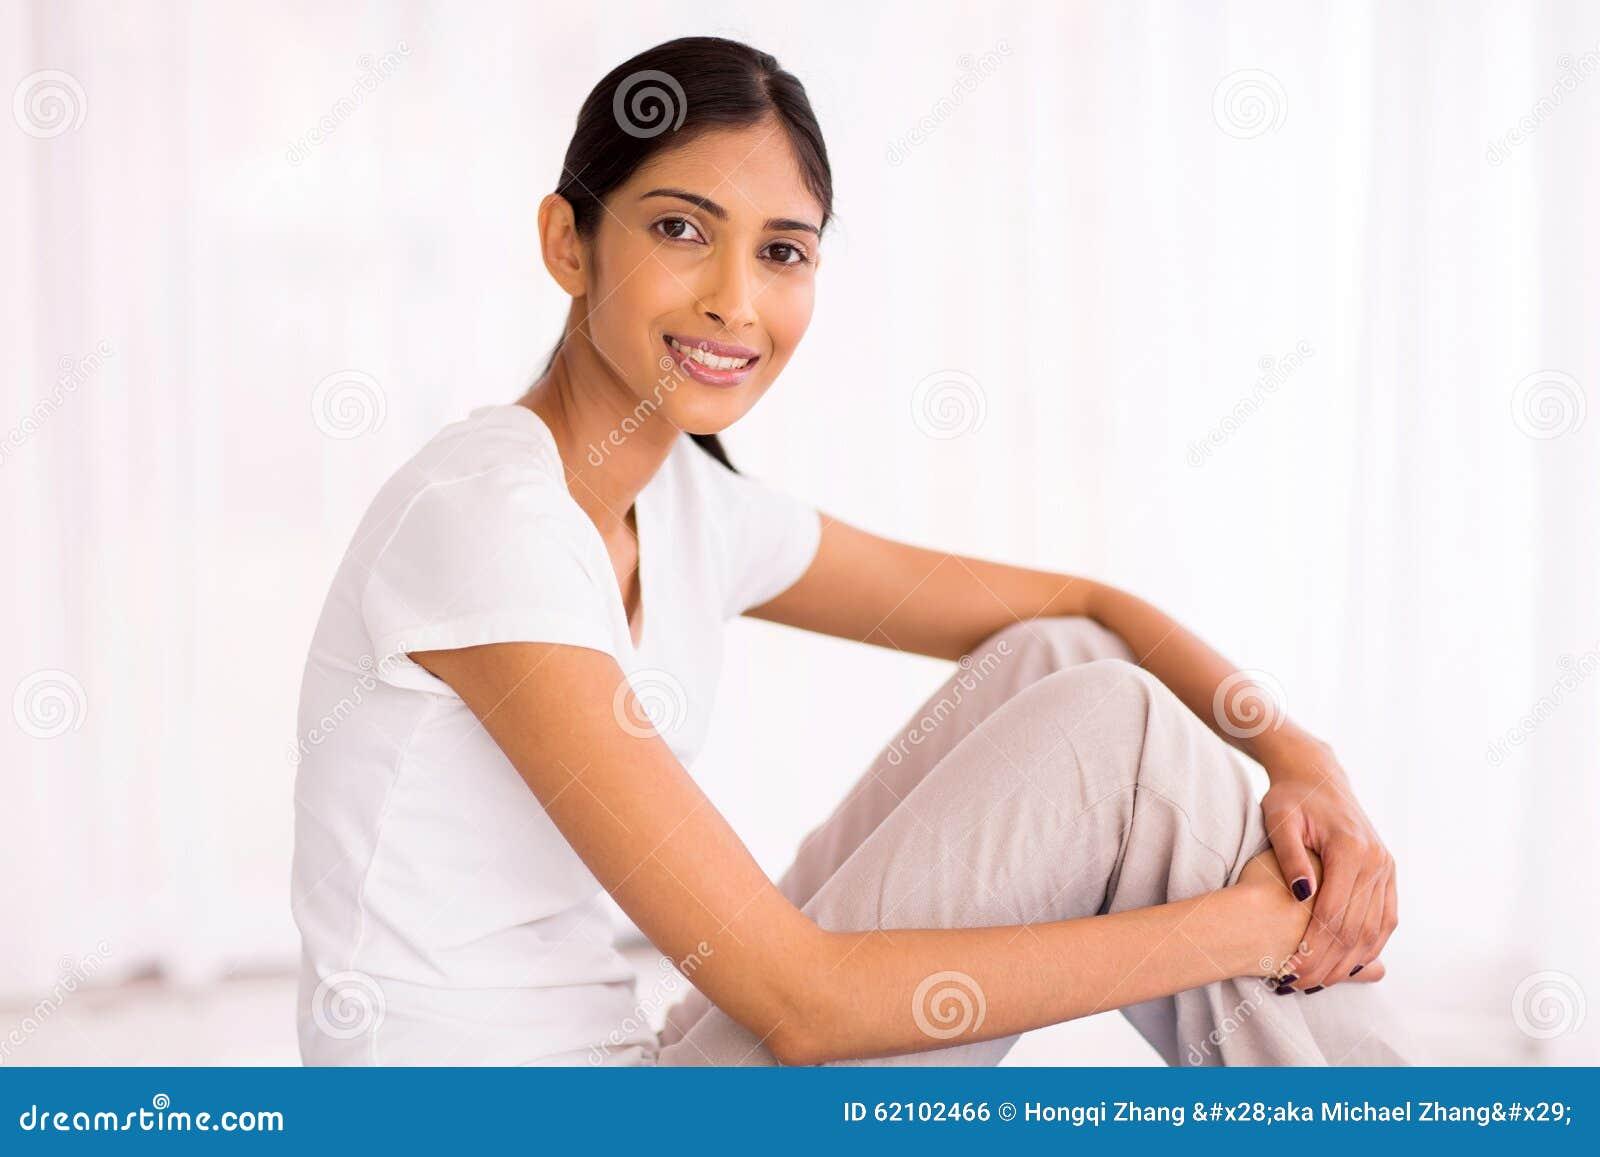 Indian Woman Sitting Stock Photo - Image: 62102466